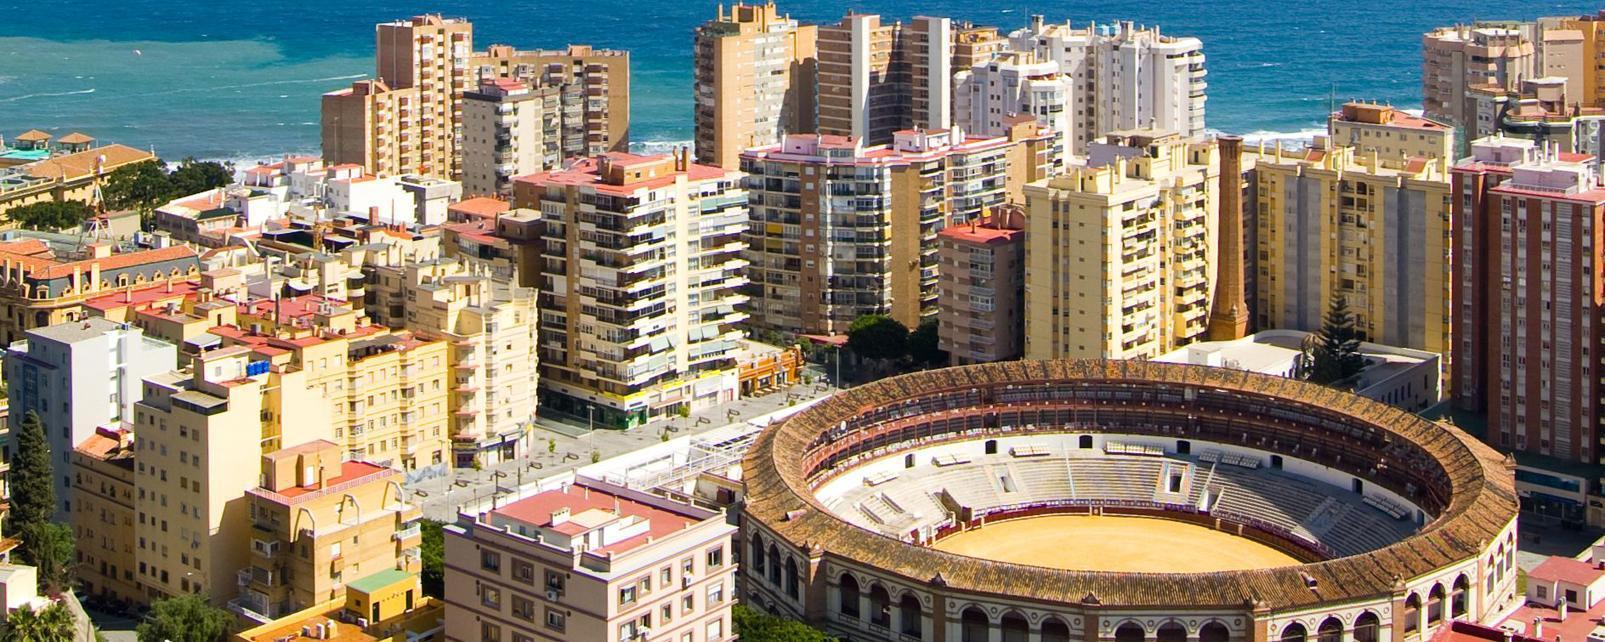 Espagne Malaga Hotel